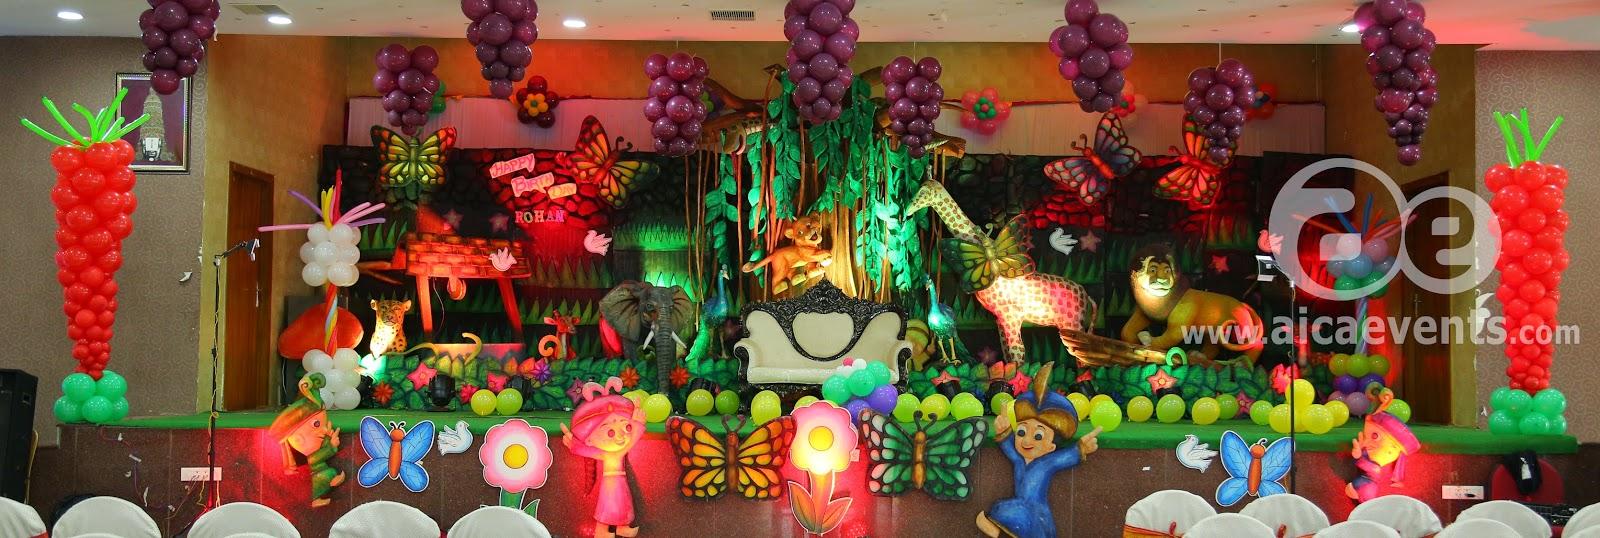 Jungle Decoration Jungle Birthday Party Decor Cake Ideas And Birthday Decorations